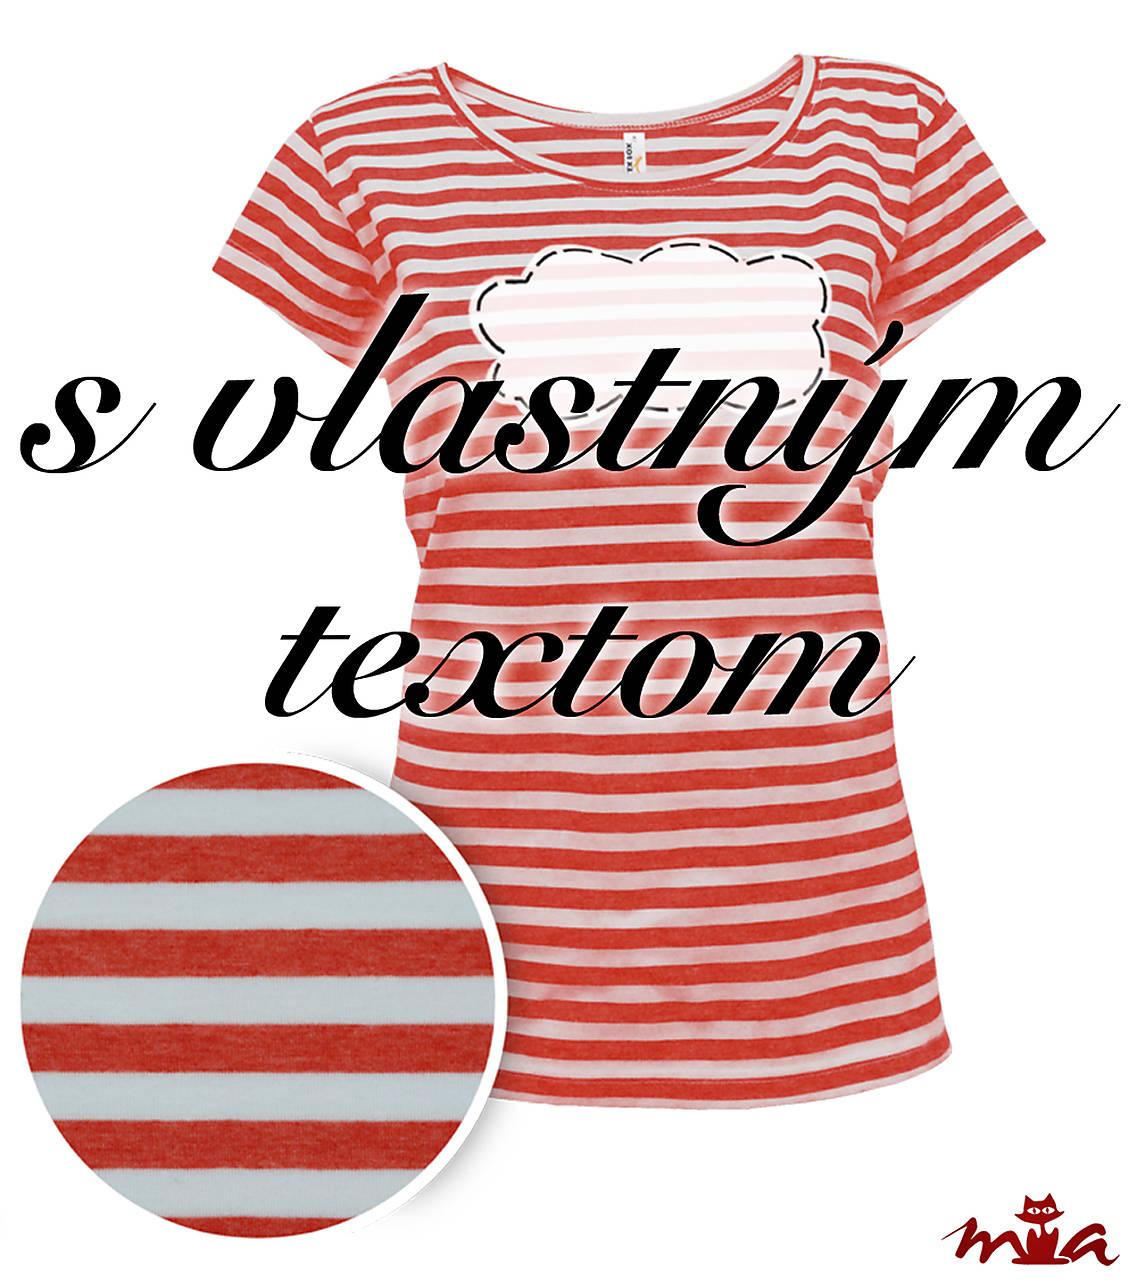 c8696500c317 Dámske červené námornícke tričko s vlastným nápisom ...